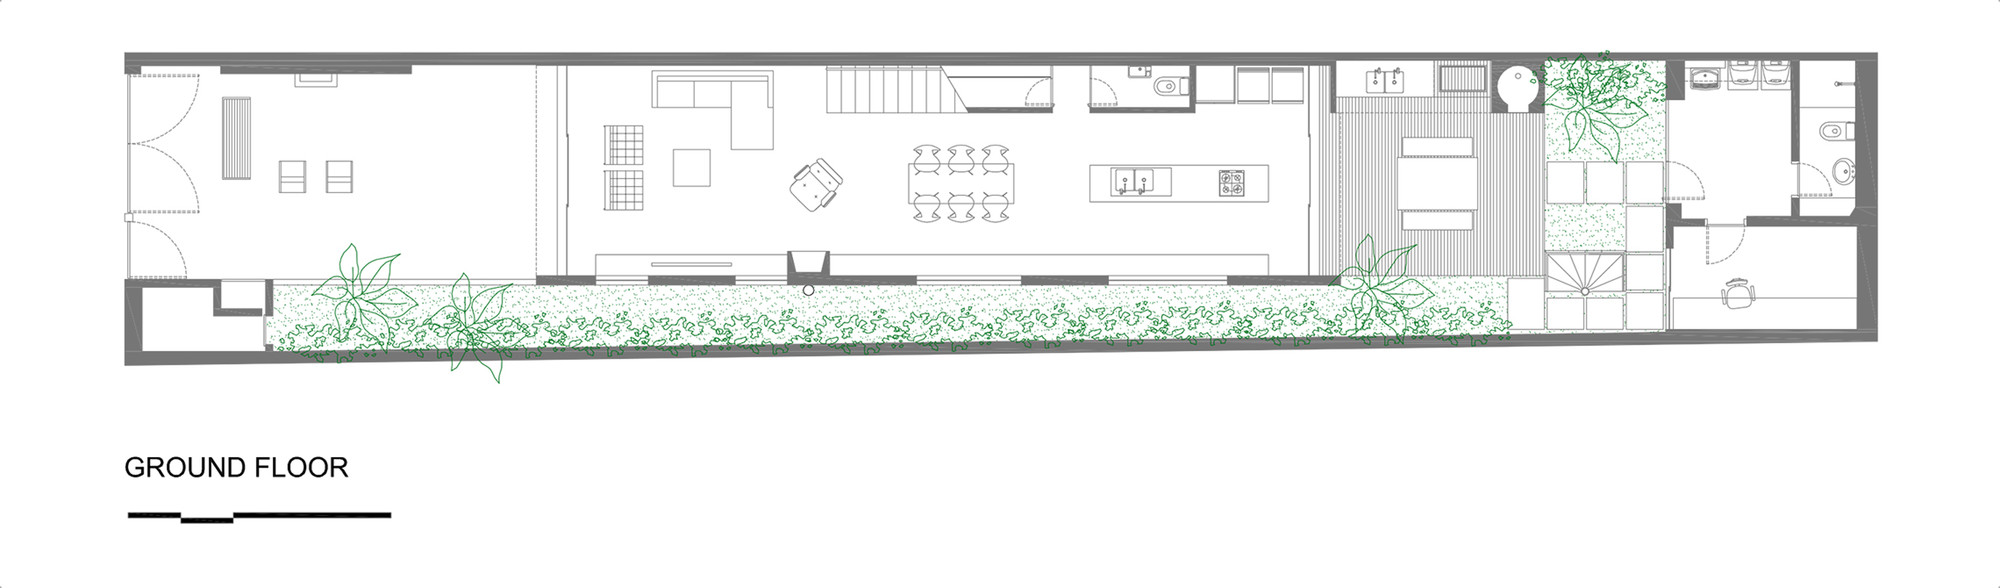 Galeria De Casa Brooklin Galeria Arquitetos 14